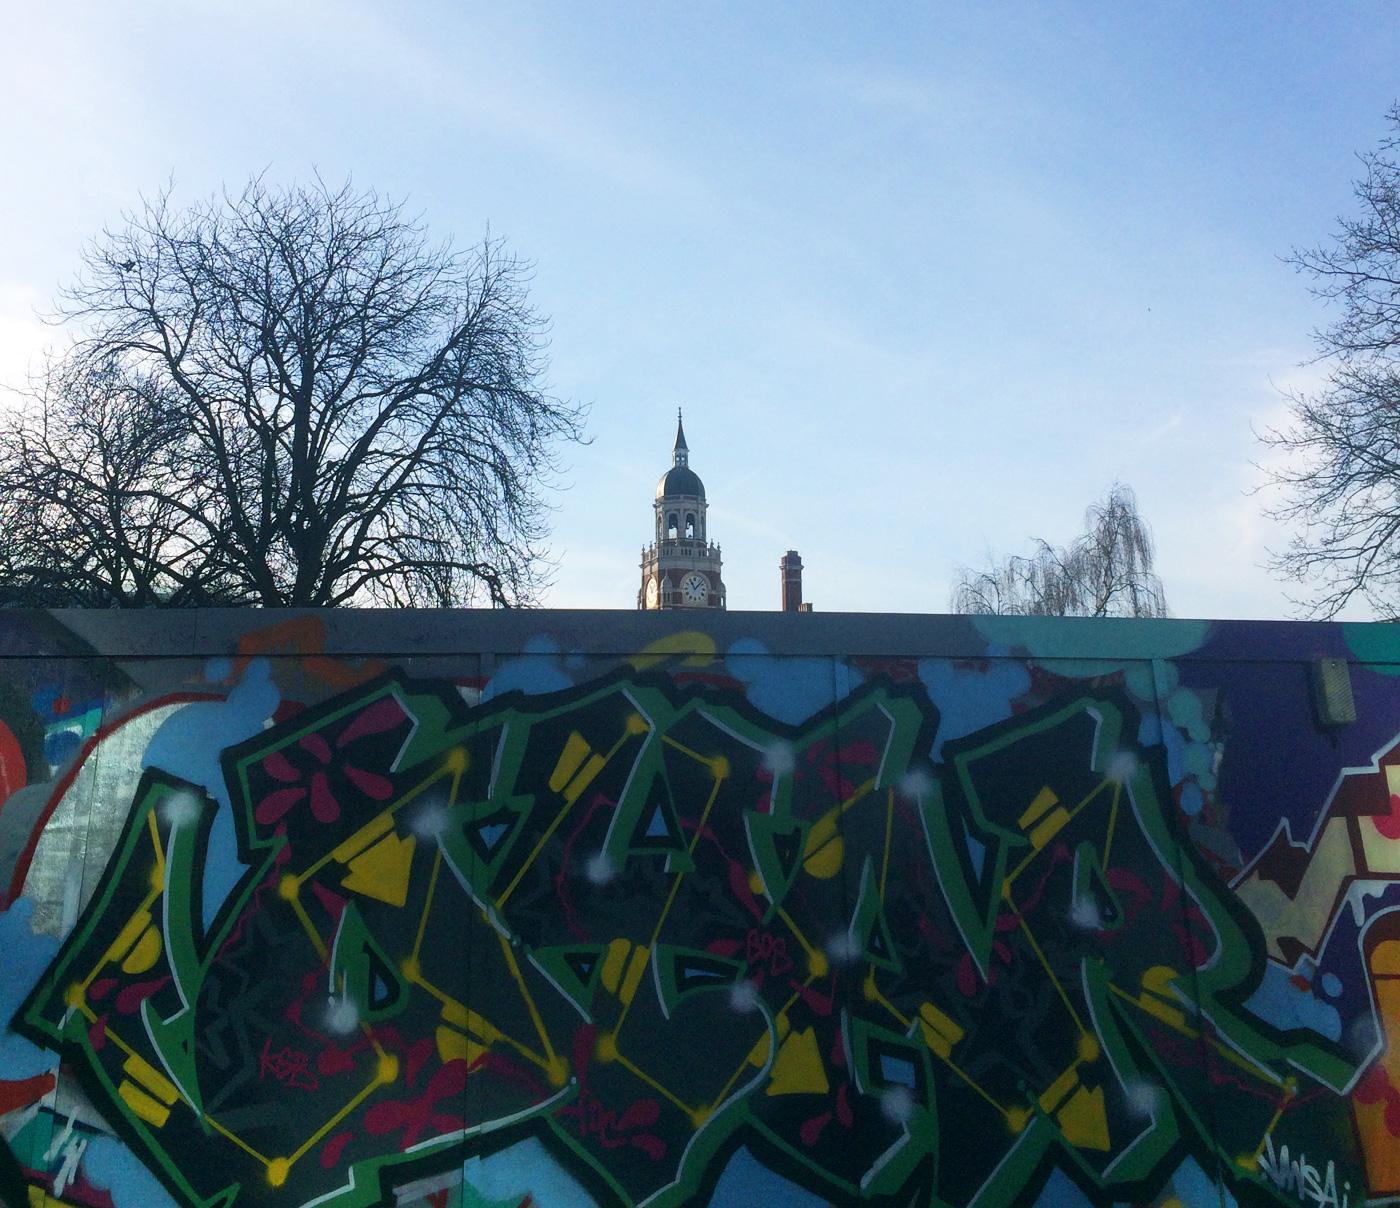 Legal graffiti wall, Queen's Gardens, Croydon